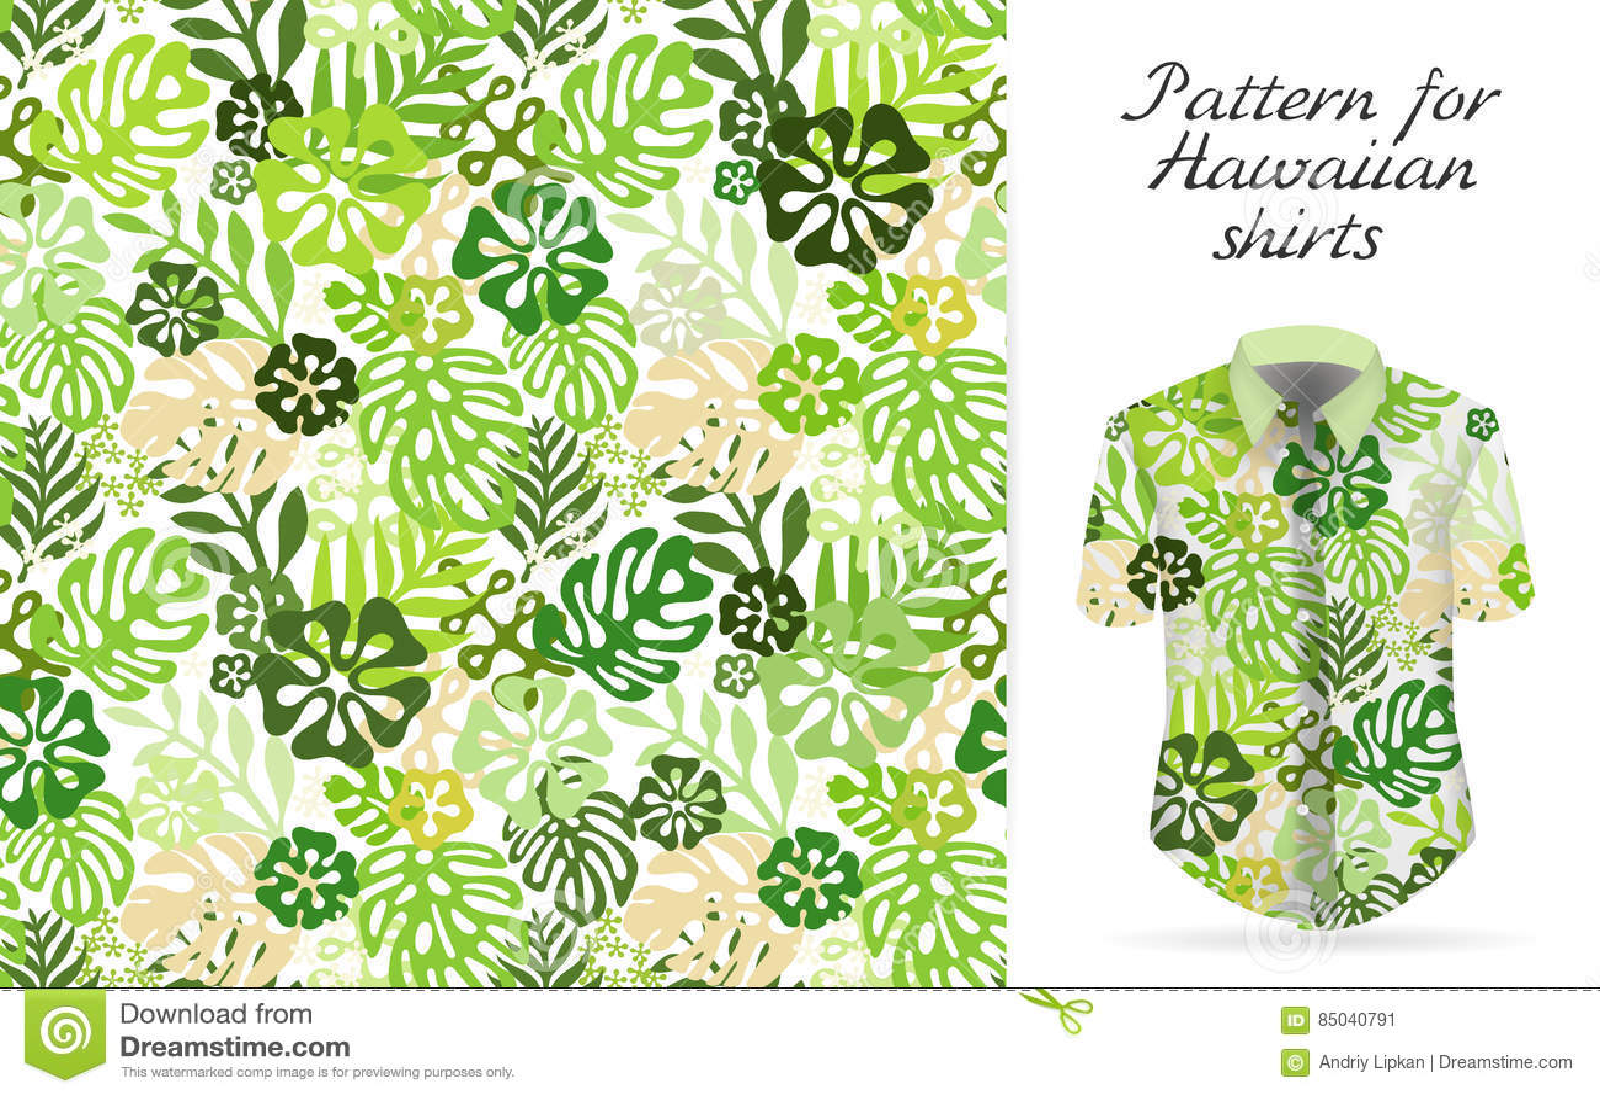 Tropical aloha pattern. Vector